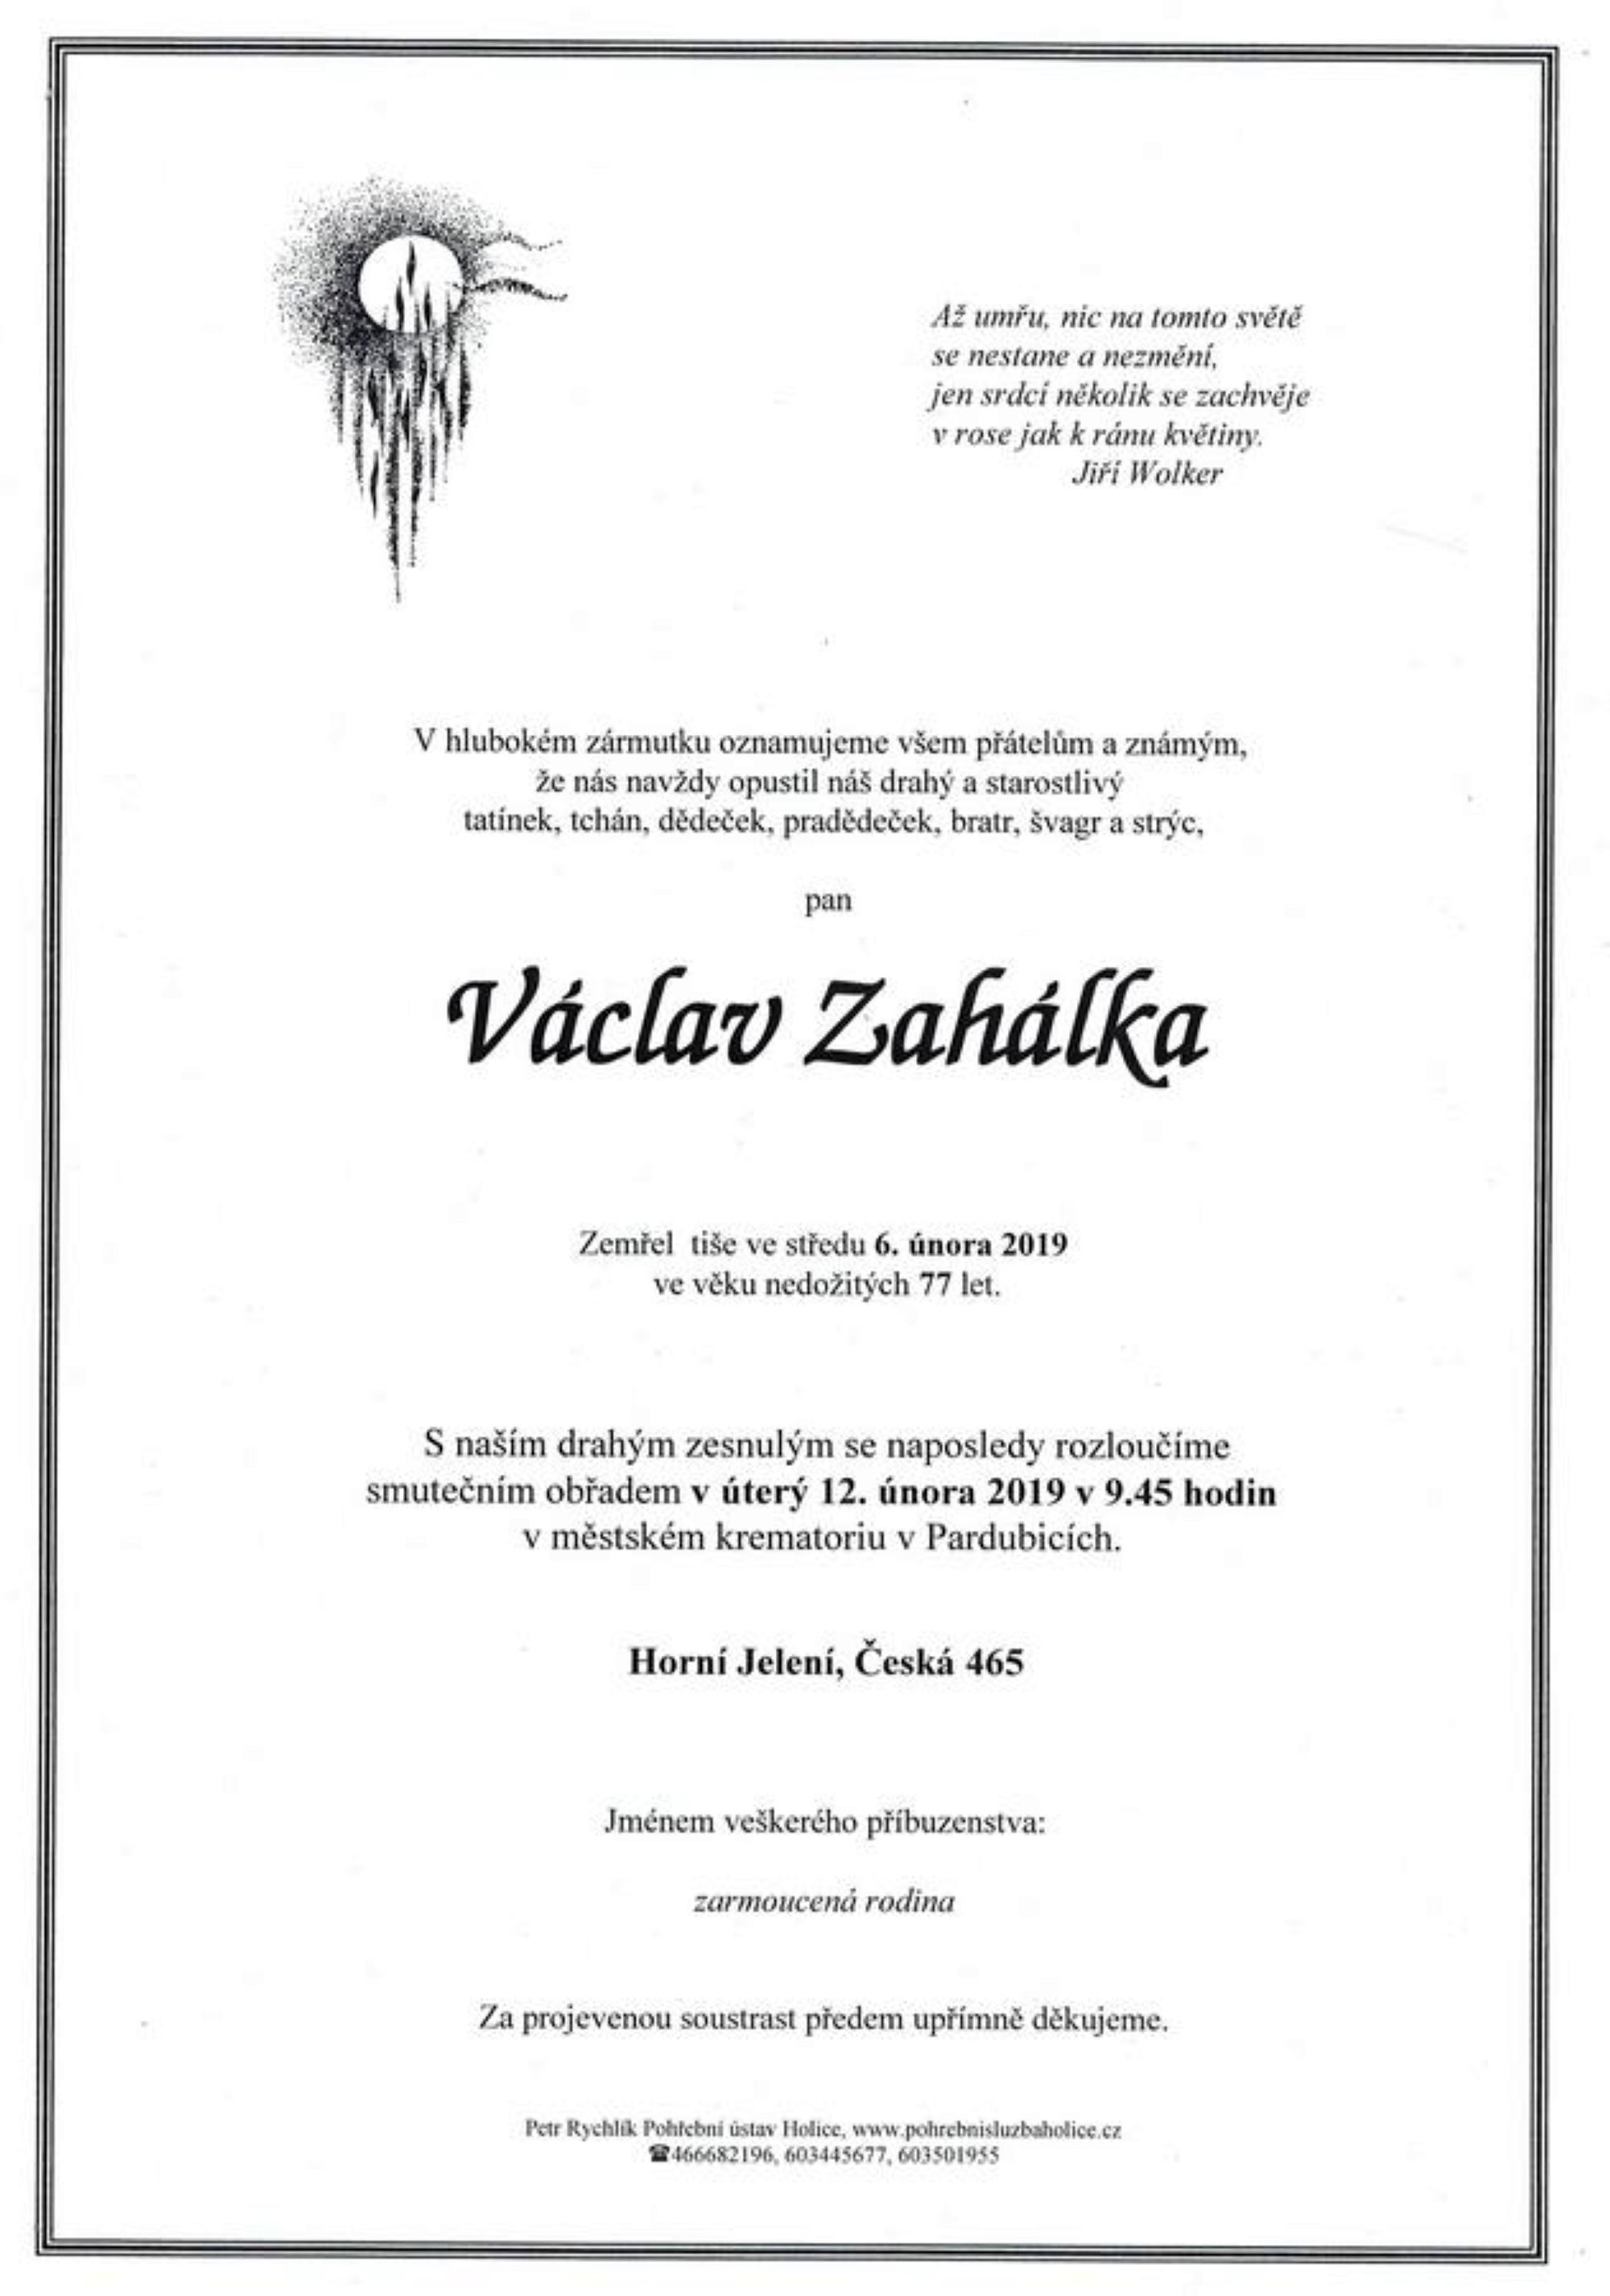 Václav Zahálka